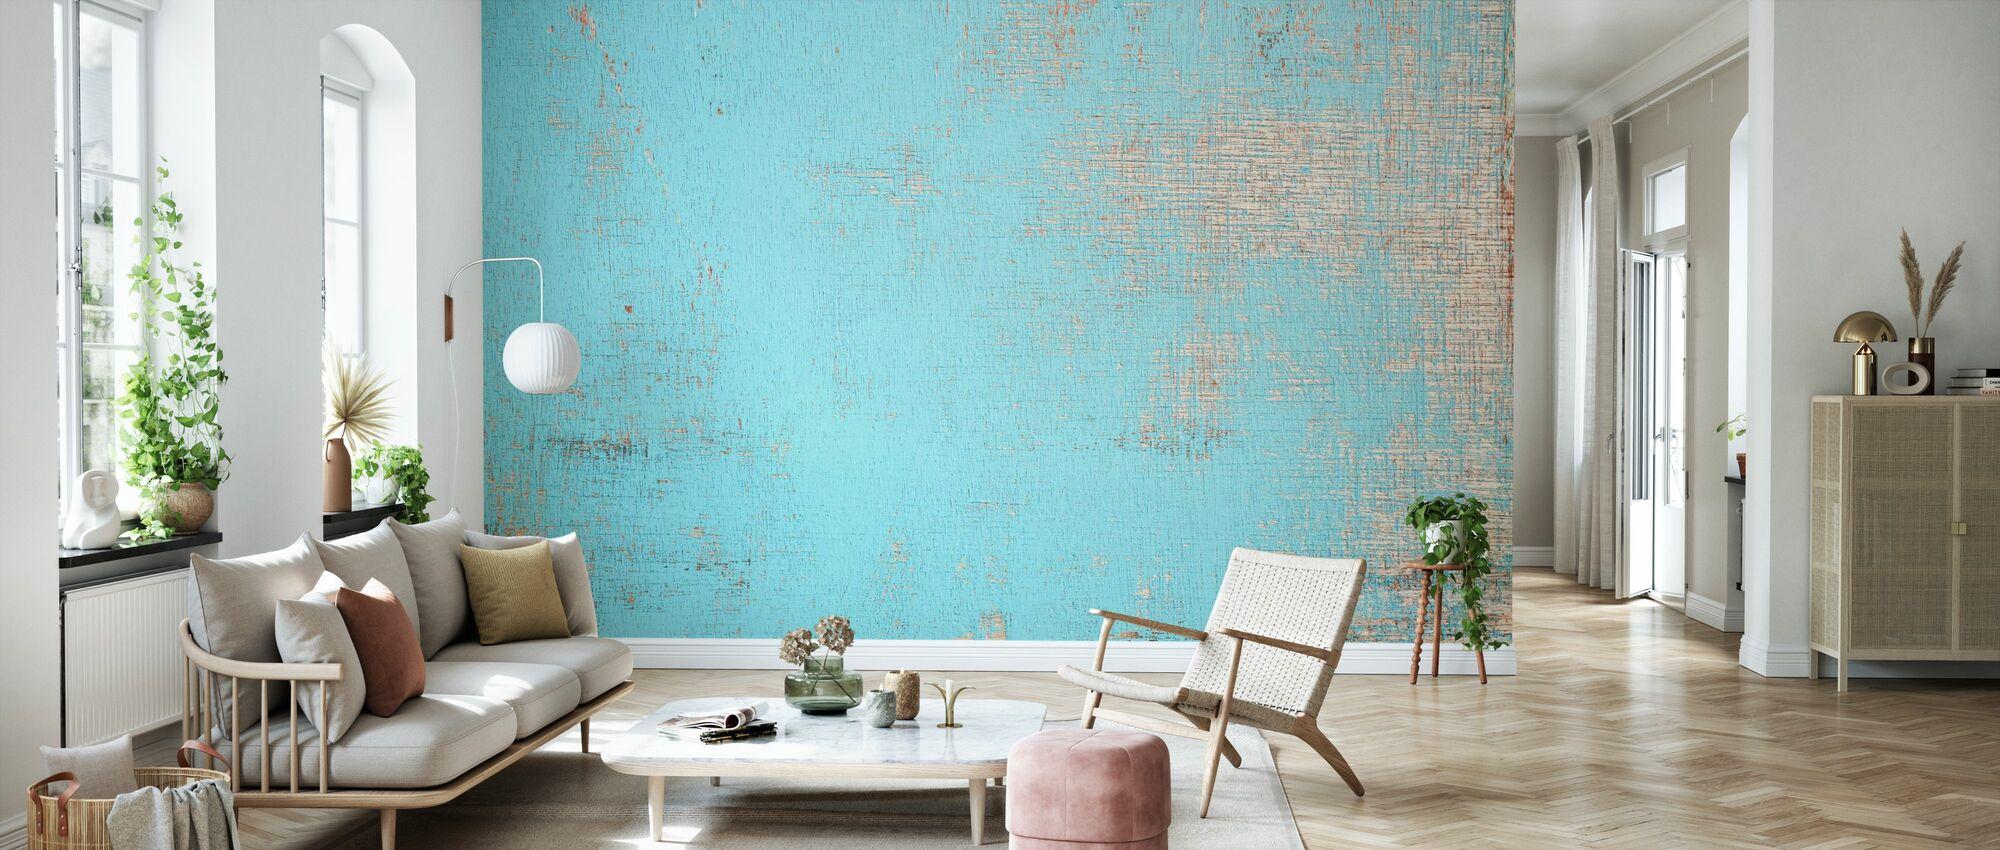 Flocked Paint Holzwand - Tapete - Wohnzimmer